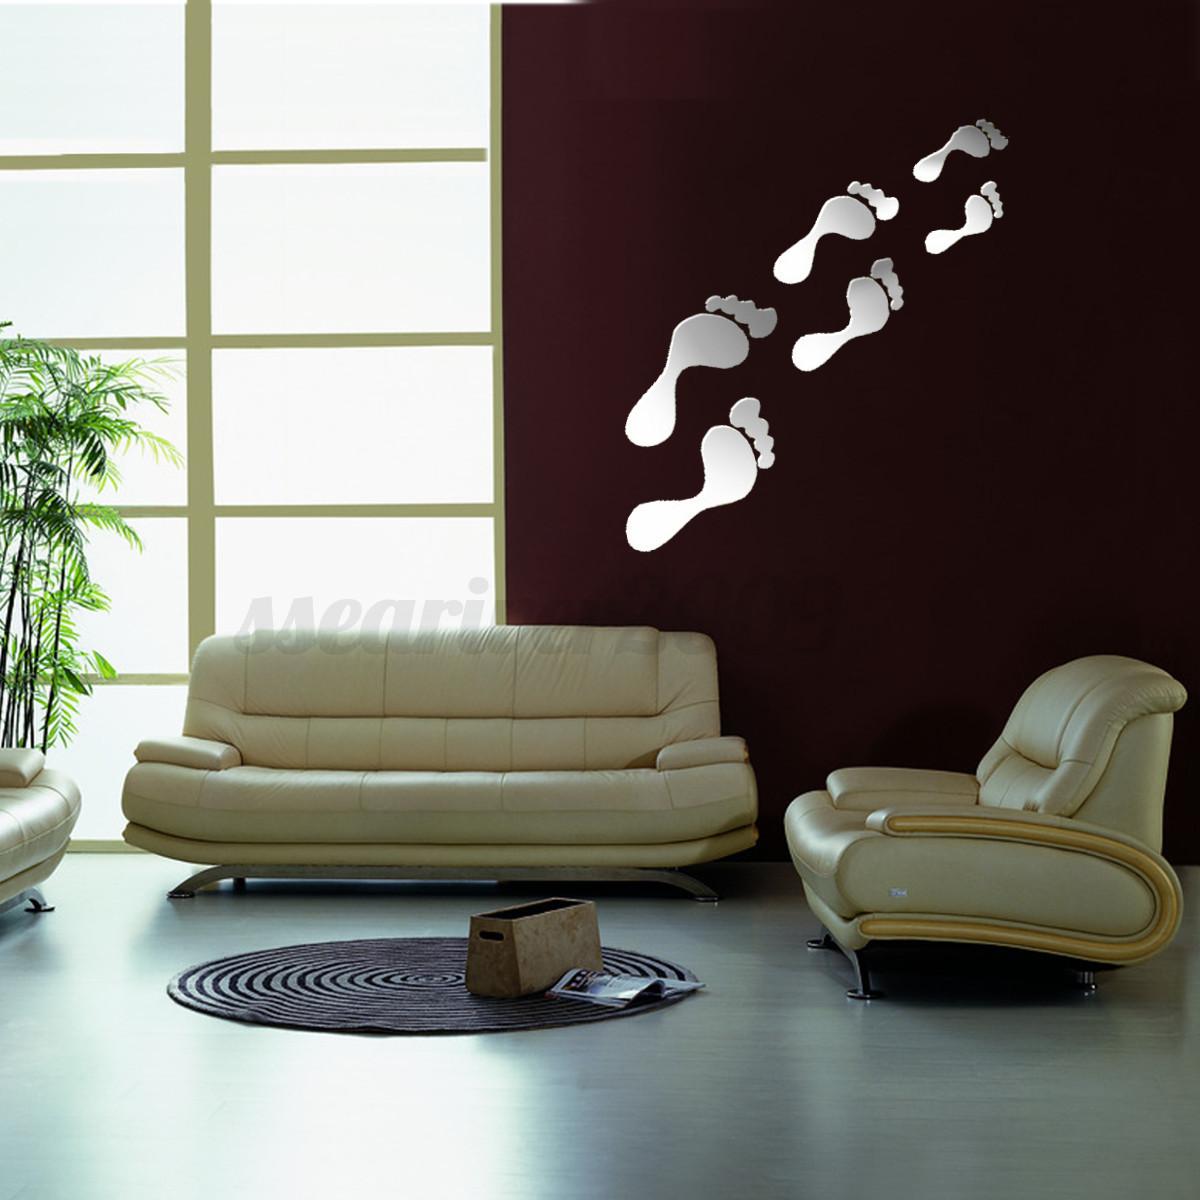 DIY 3D Silver Mirror Surface Wall Sticker Mural Decal Art Living Room Home Decor